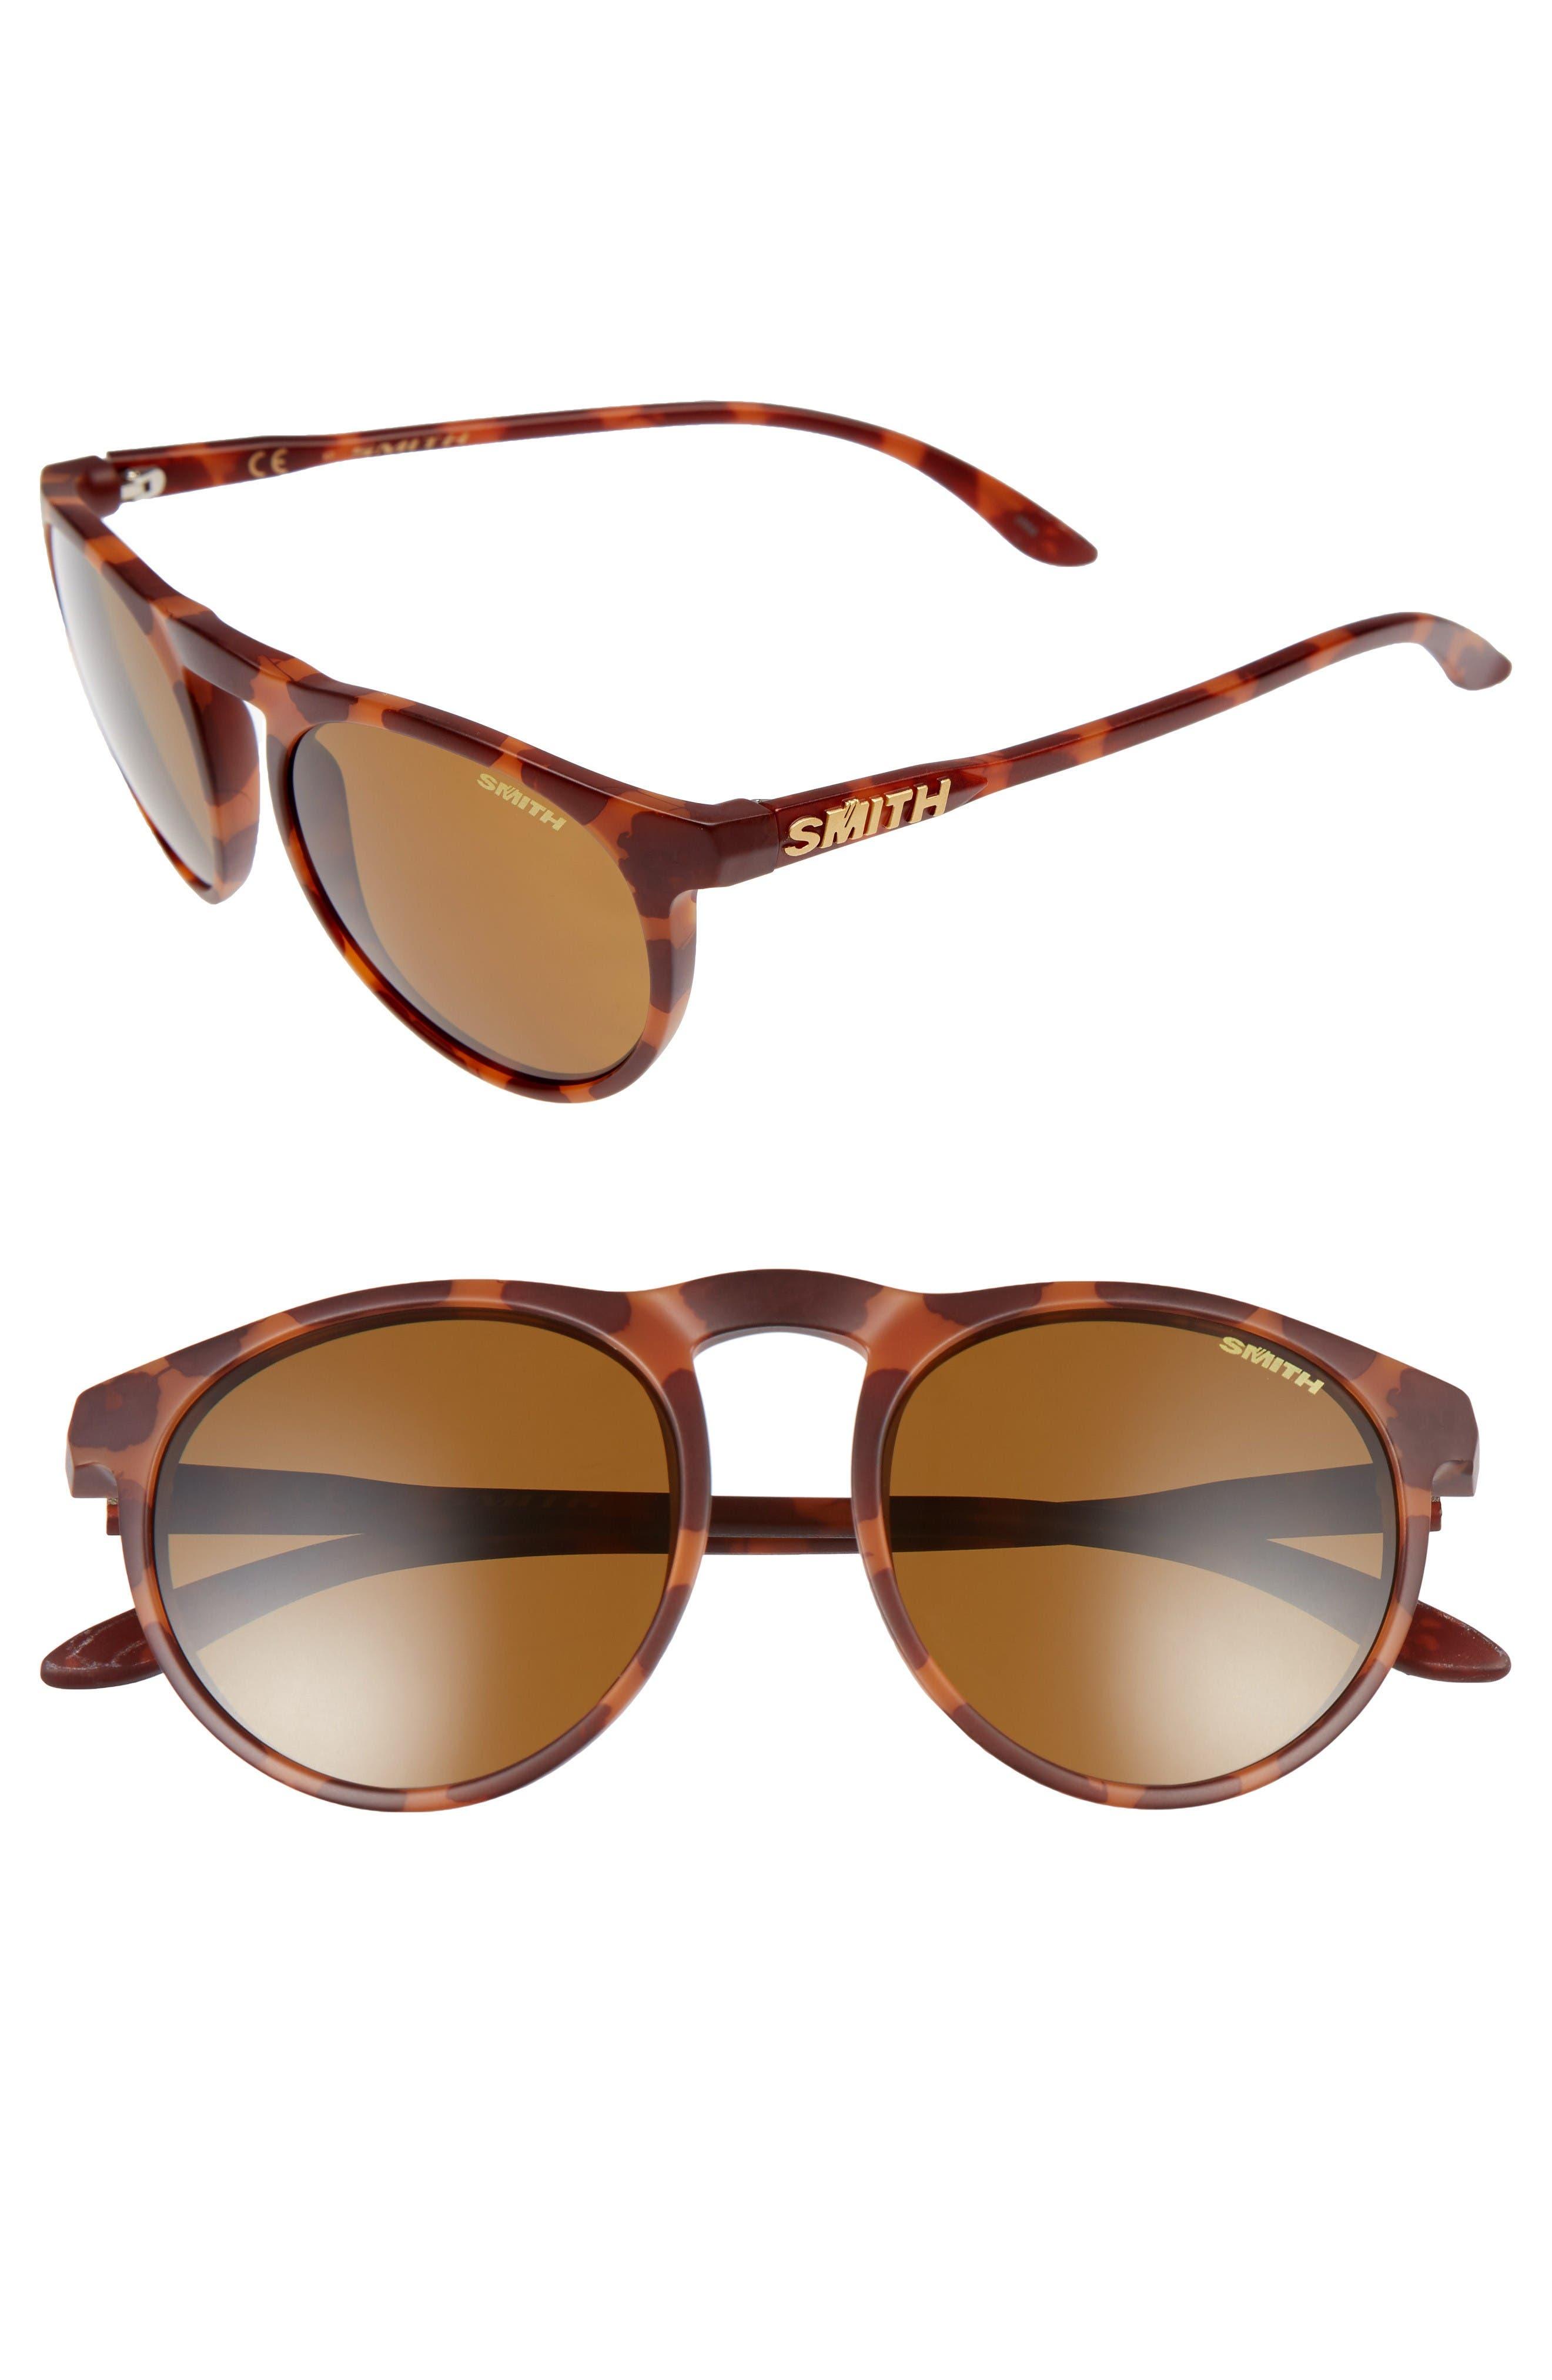 Marvine 52mm Polarized Round Sunglasses,                             Main thumbnail 1, color,                             Matte Tortoise